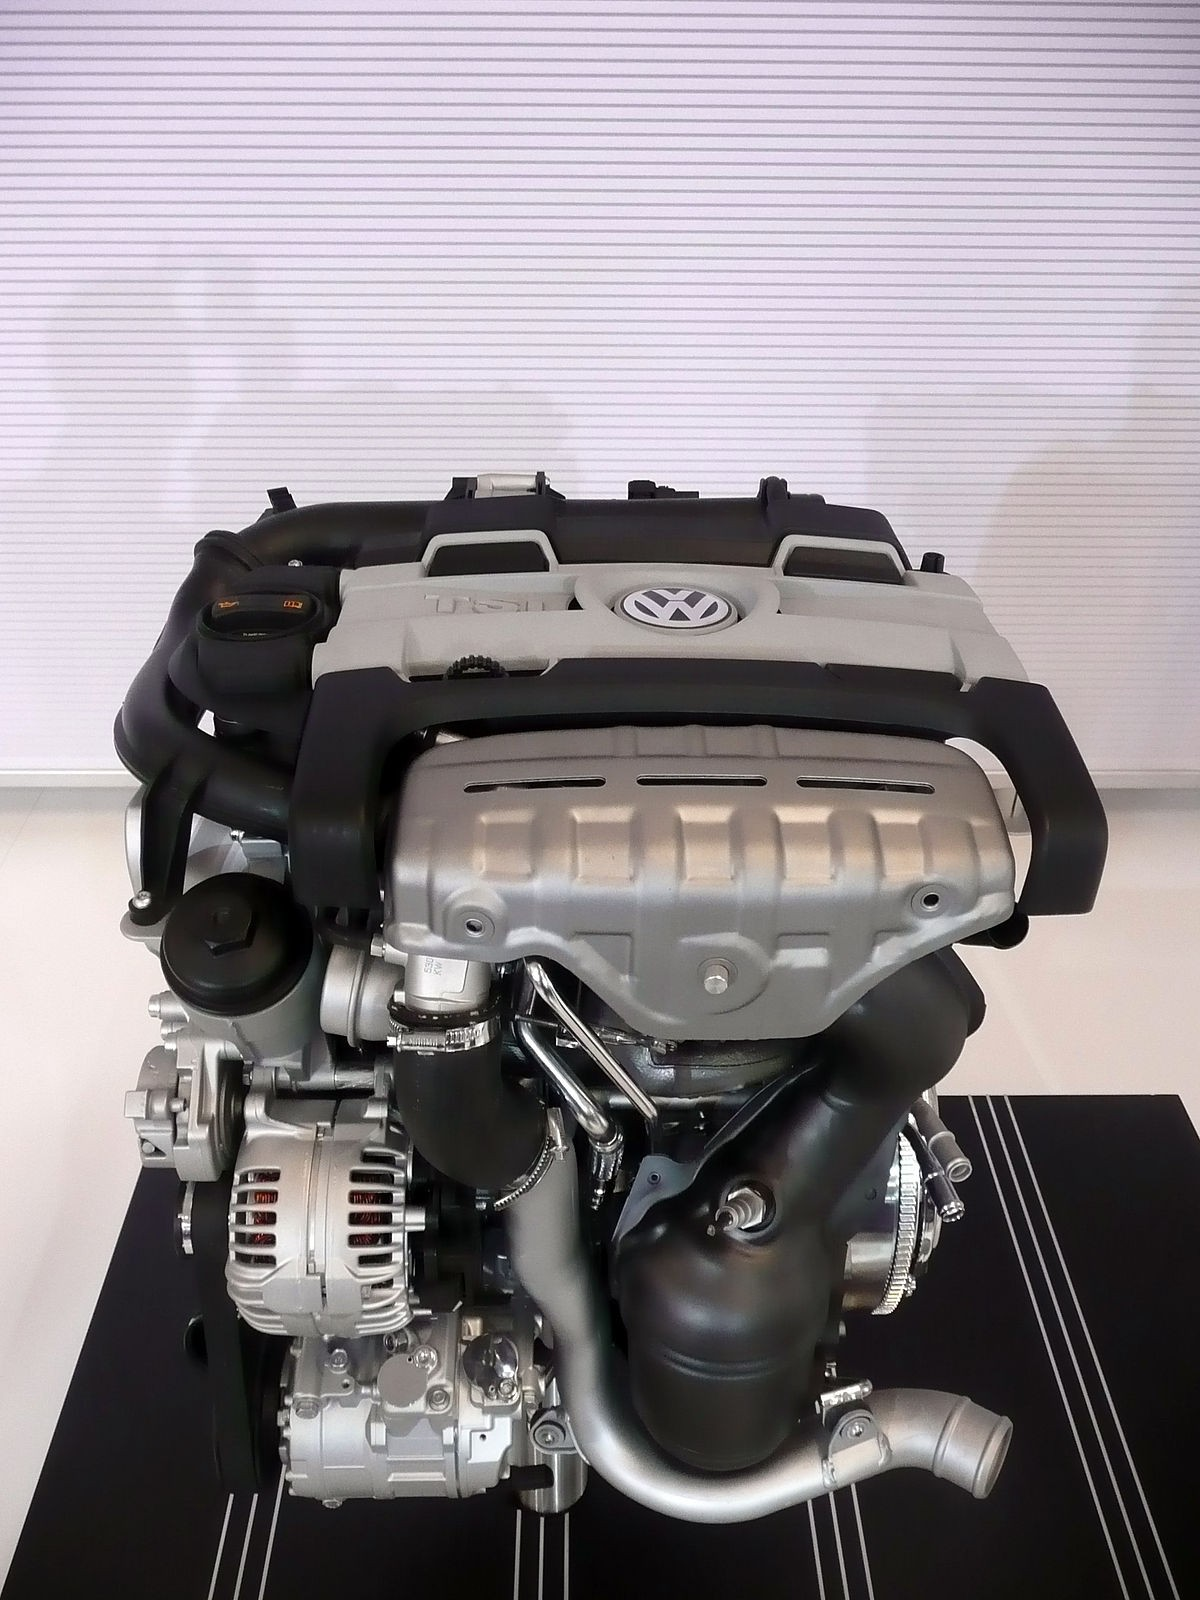 2 0 Tsi Engine Diagram 2 List Of Volkswagen Group Petrol Engines Of 2 0 Tsi Engine Diagram 2